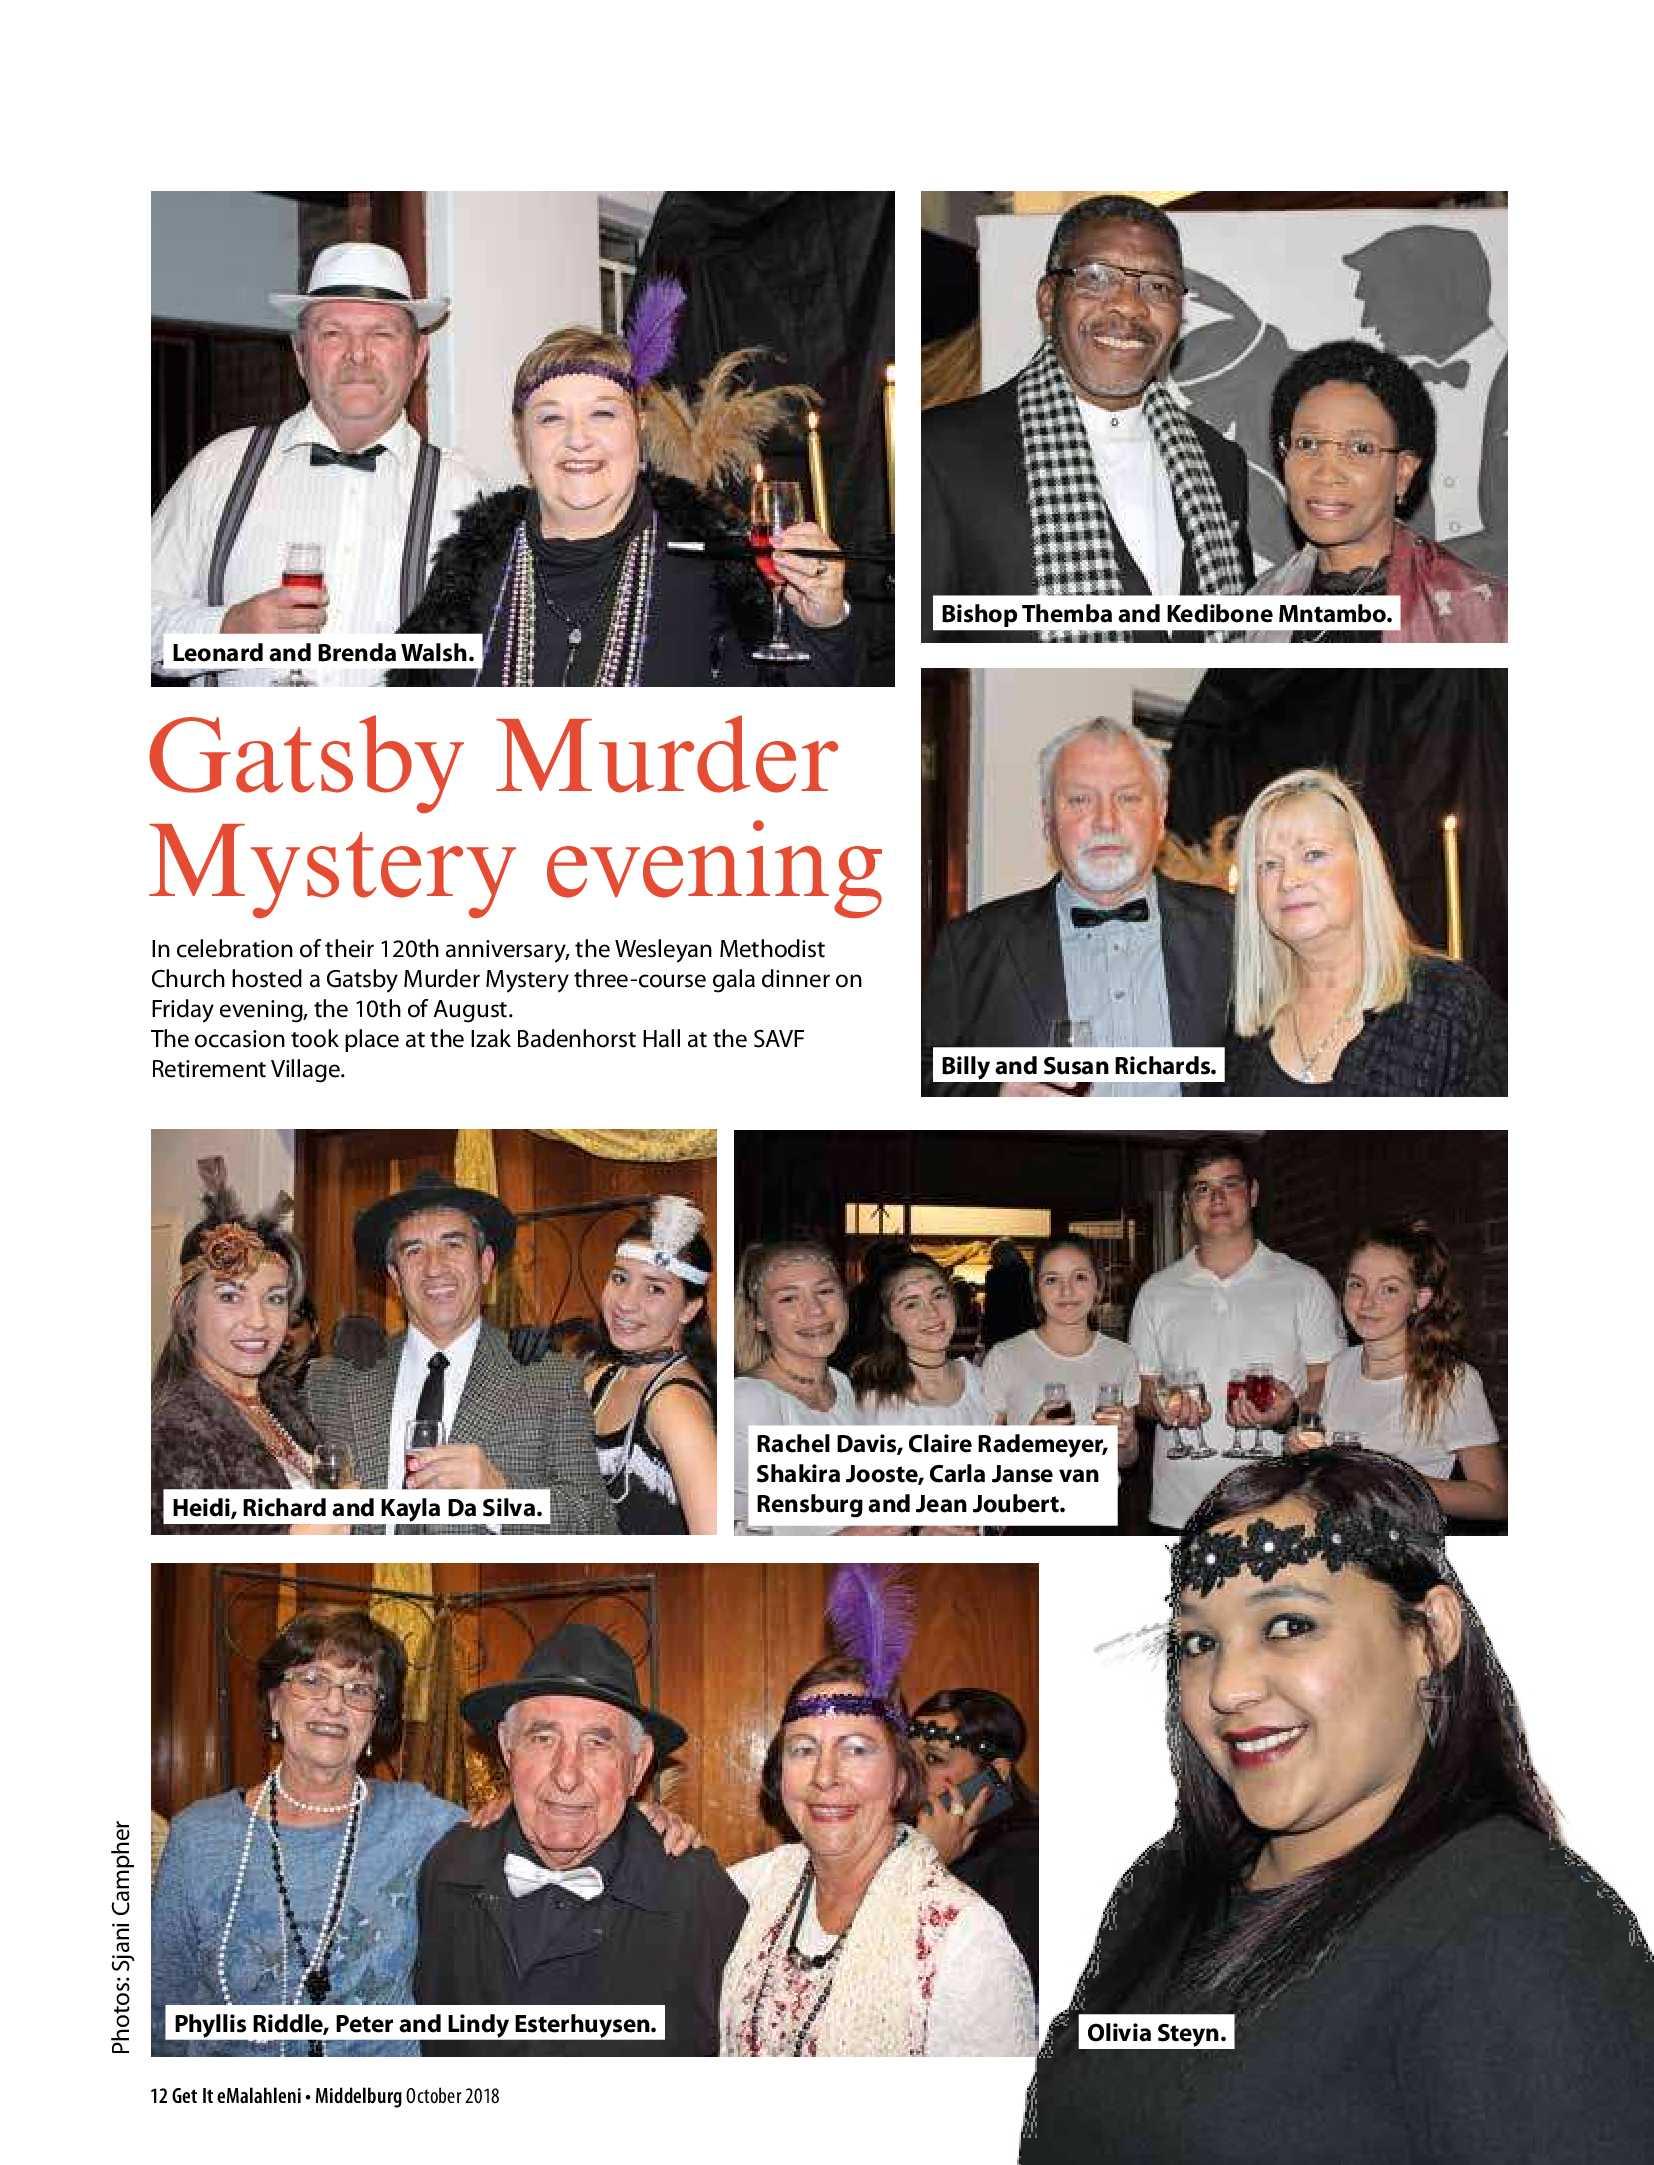 get-middelburg-october-2018-epapers-page-14